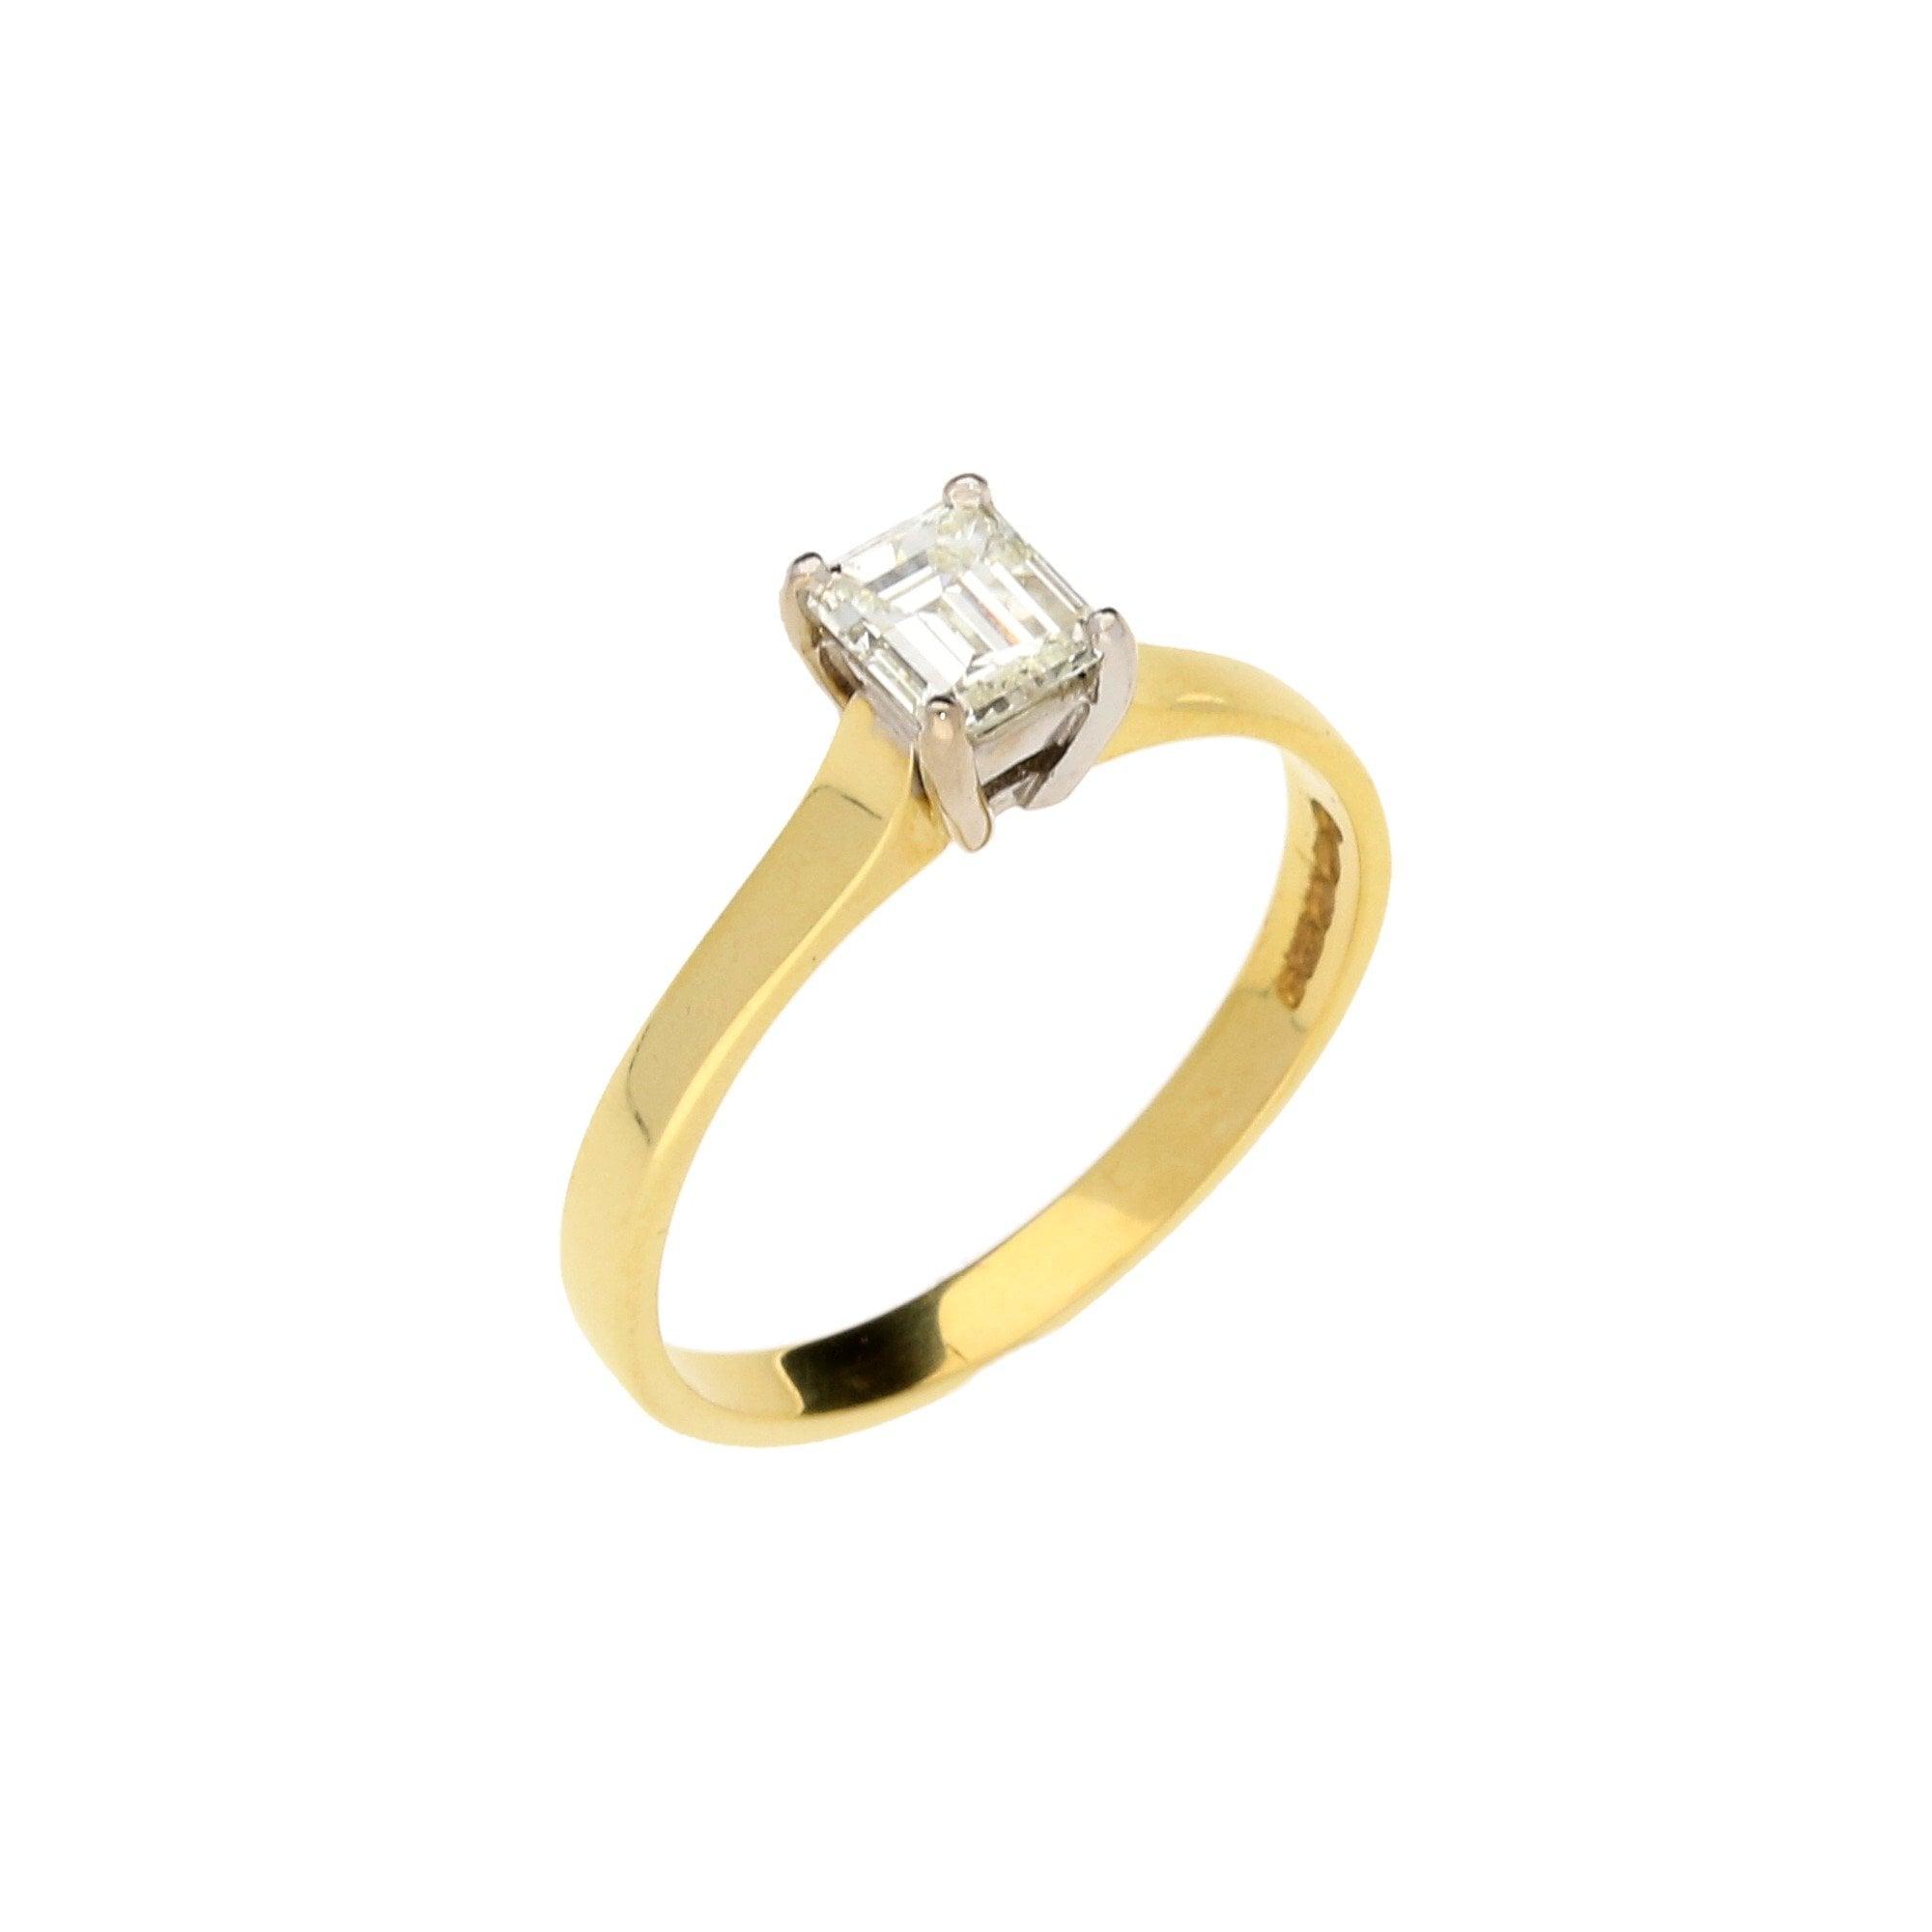 18ct Yellow Gold 0 54ct Emerald Cut Diamond Engagement Ring Miltons Diamonds